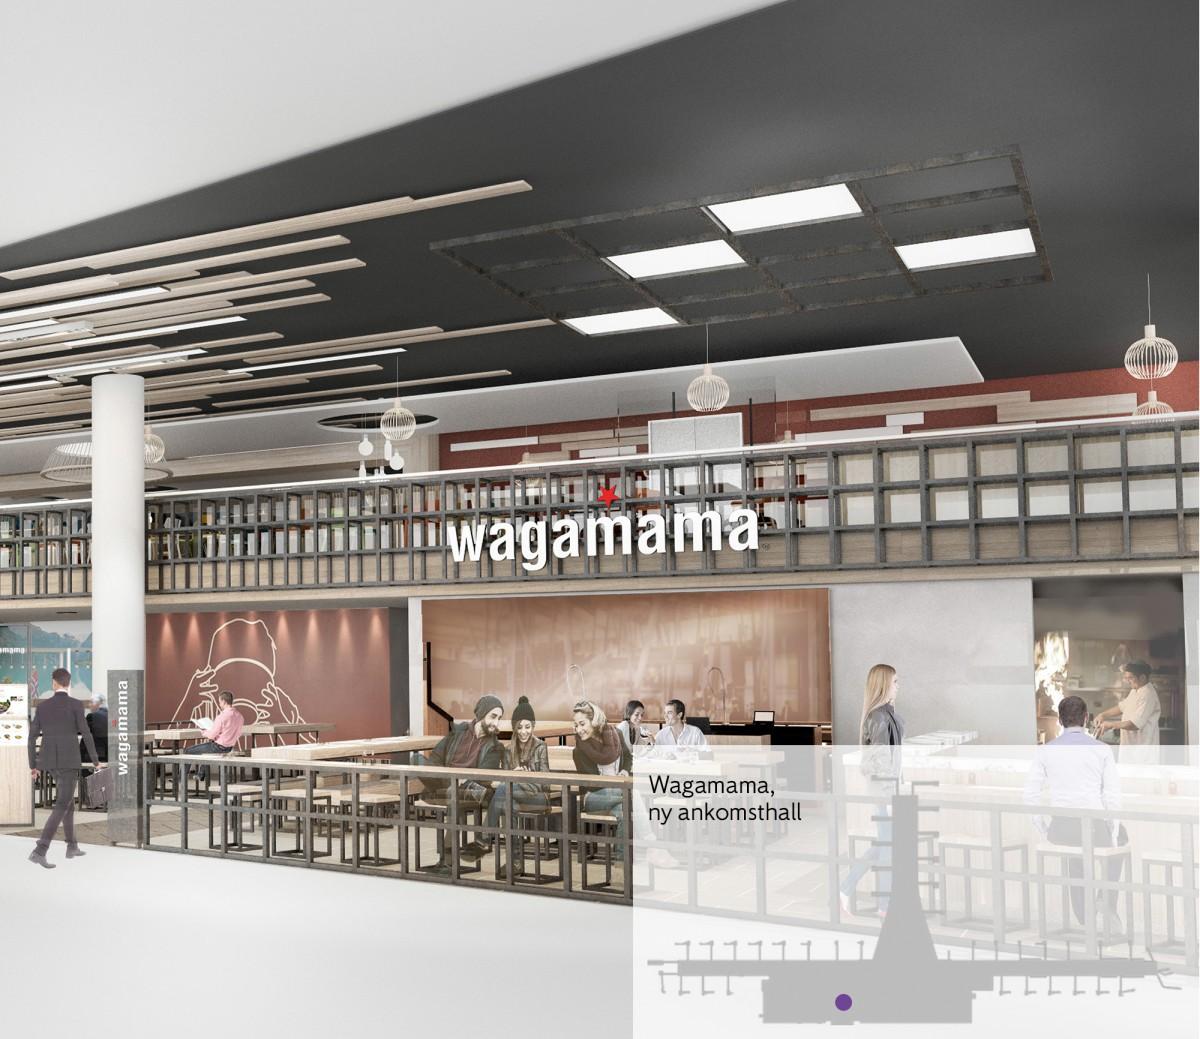 Wagamama_kart_high